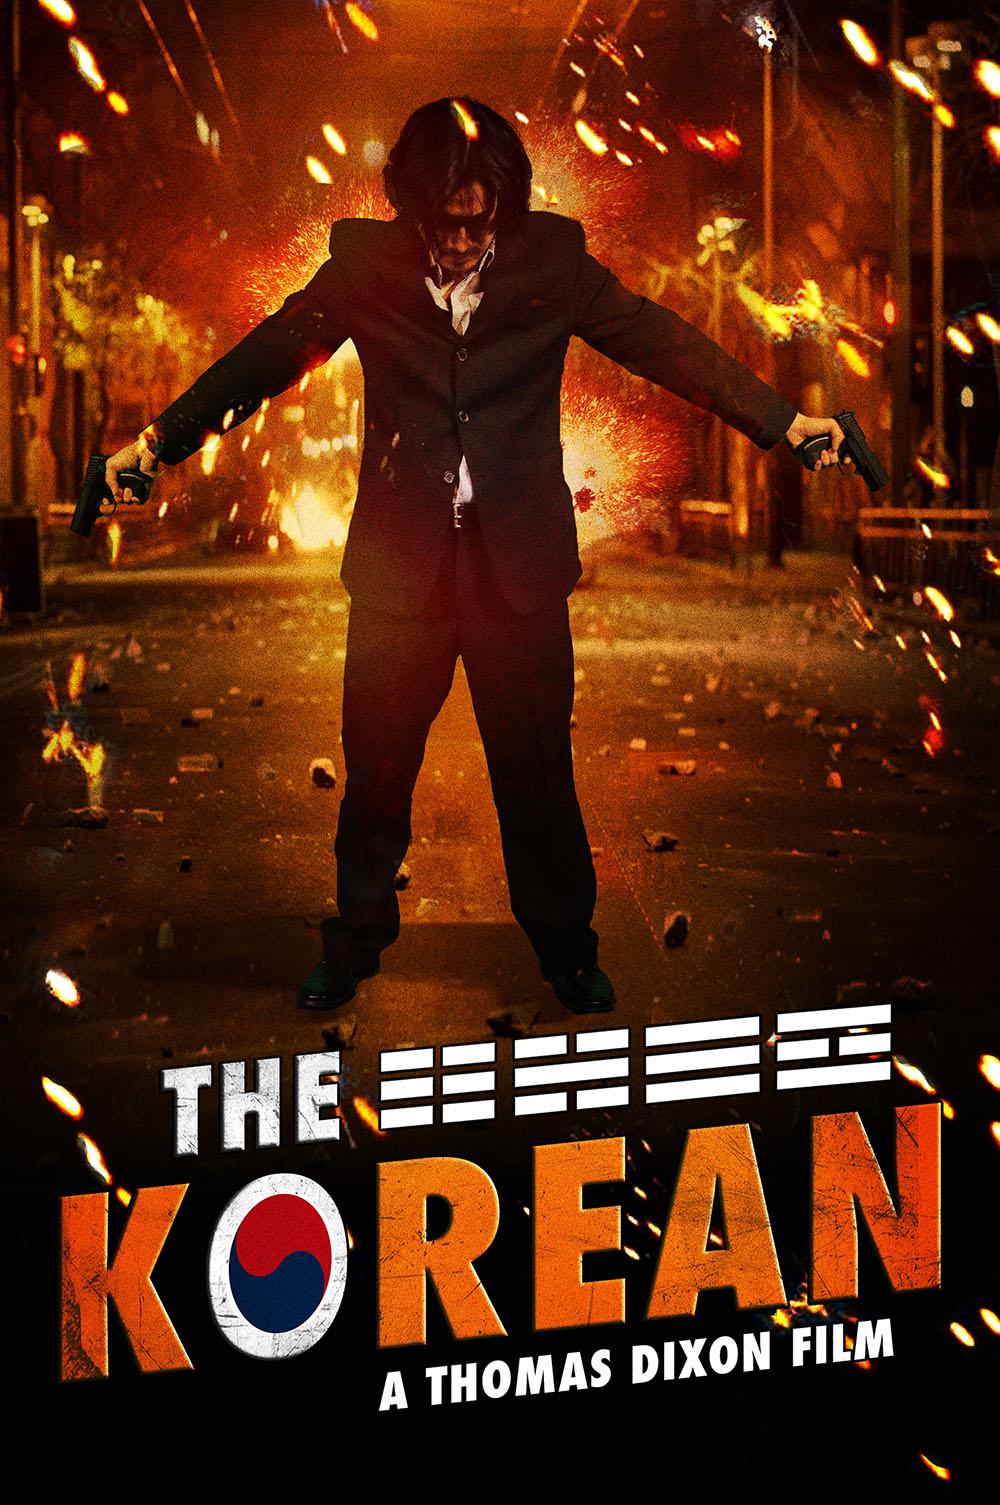 thekorean-01.jpg